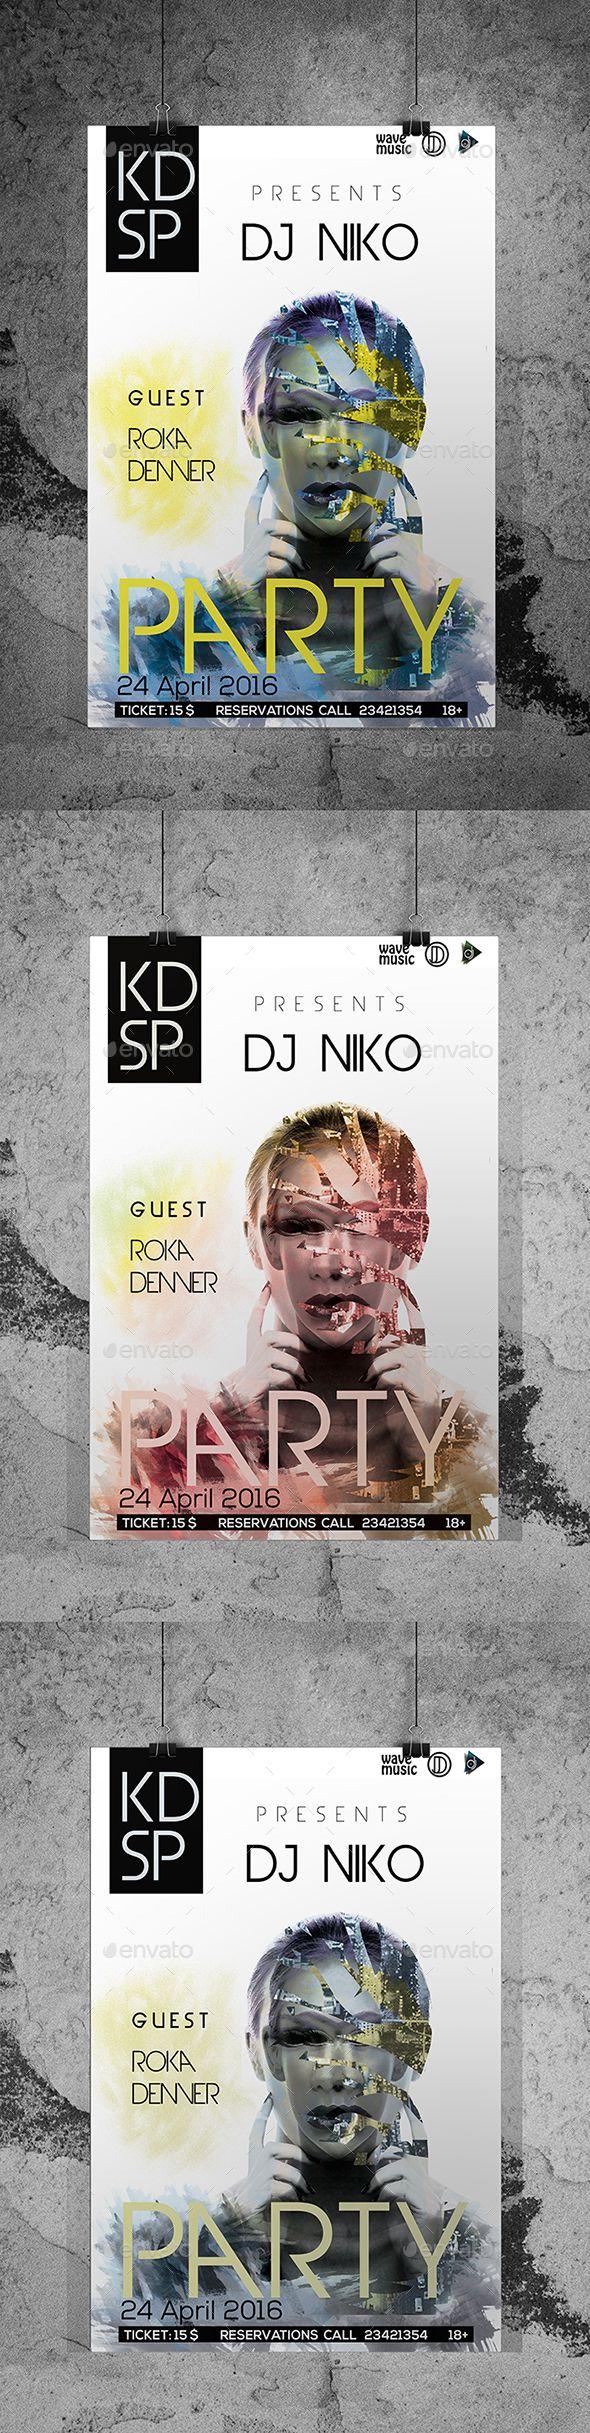 DJ Club Party Flyer/Poster Custom PSD File  #design graphicriver abstract poster @sagaciousdesign